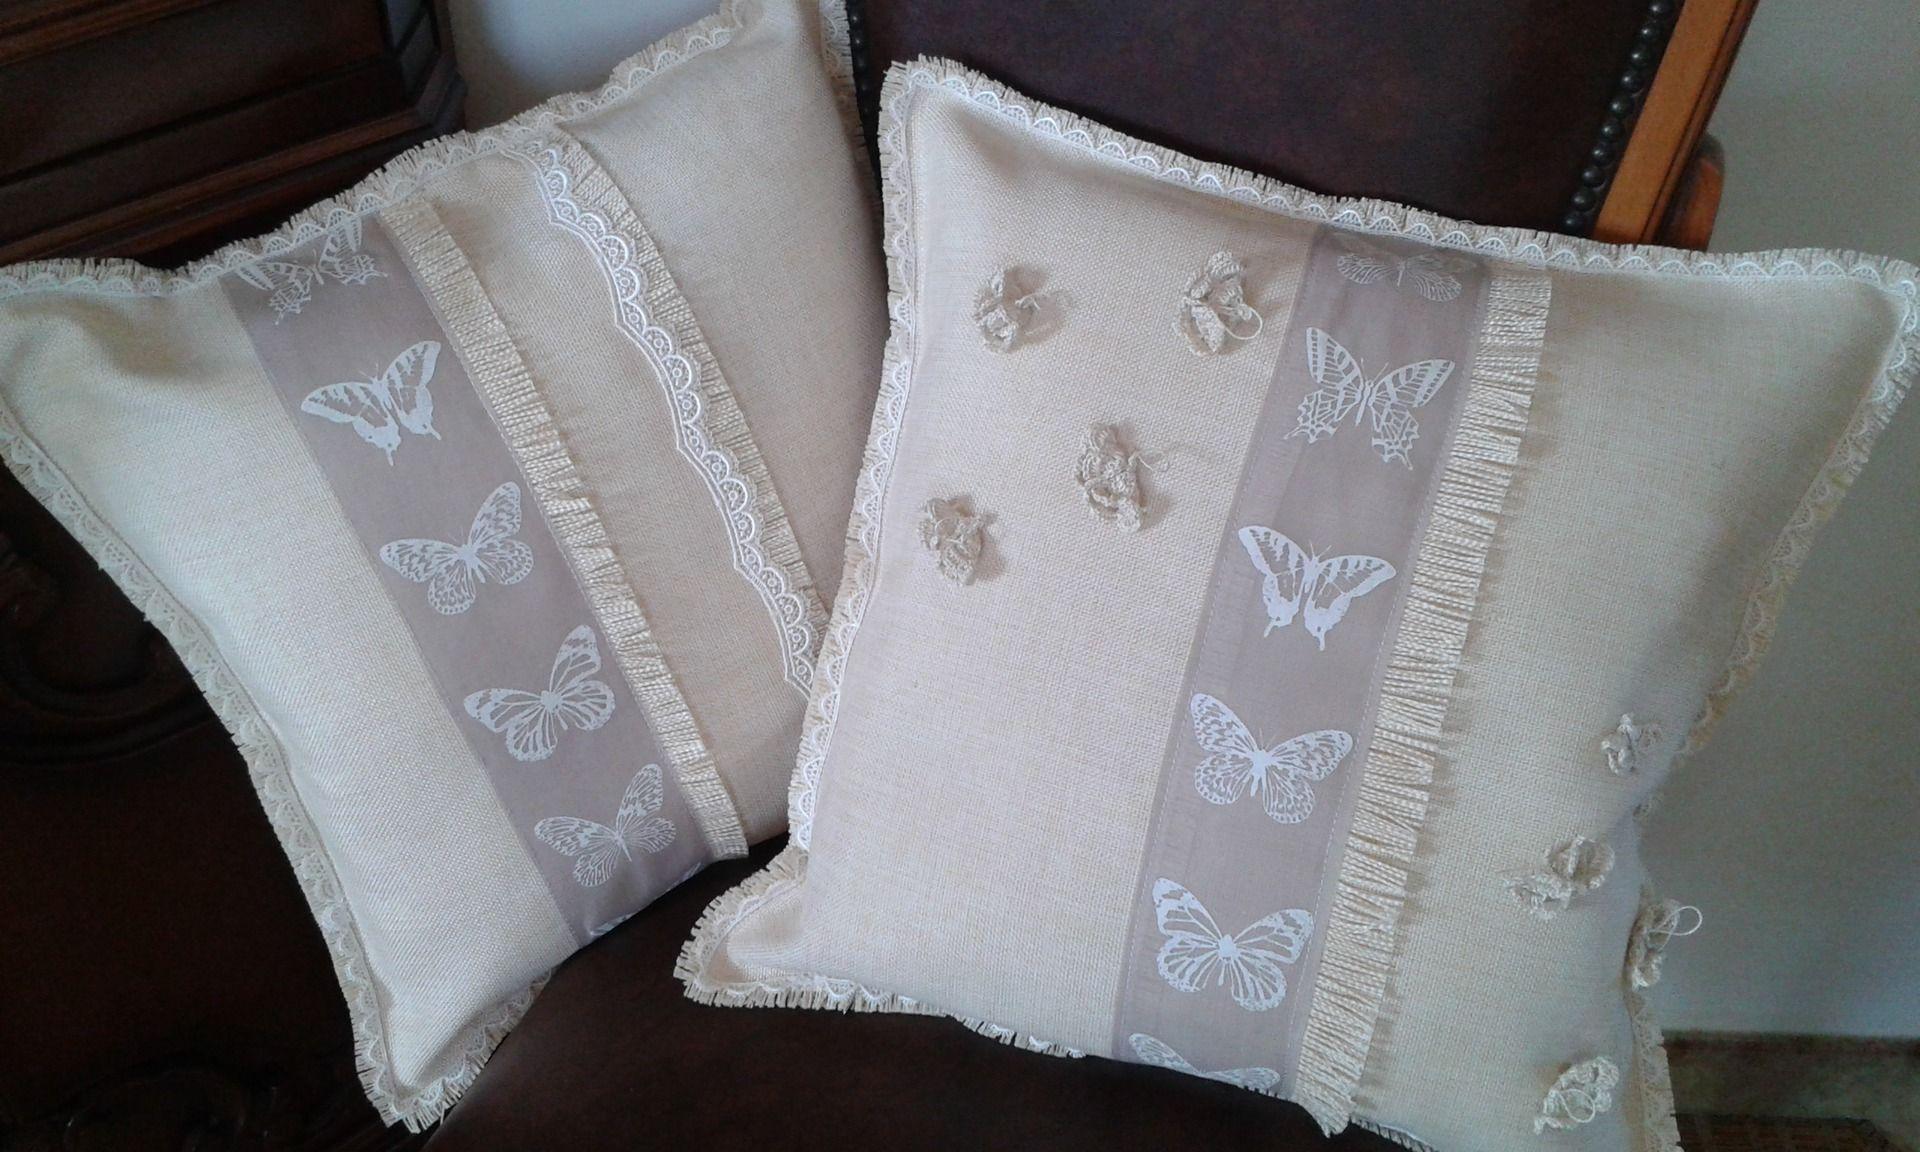 tessili e tappeti cuscini shabby chic in tela di lino